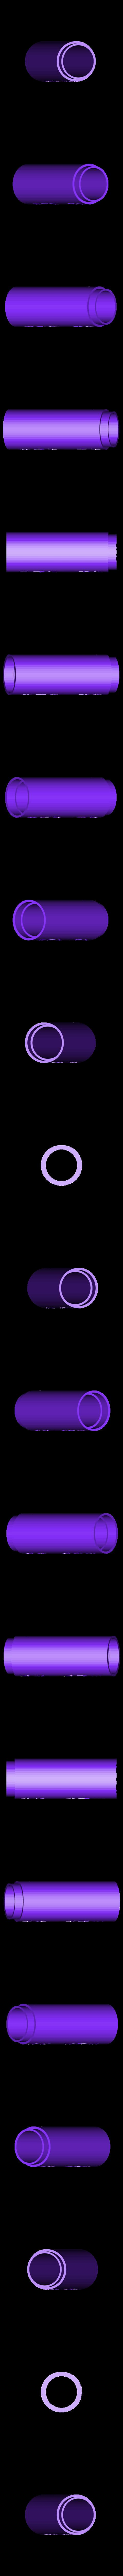 02.stl Download free STL file Fuse Hollow • Model to 3D print, delmich